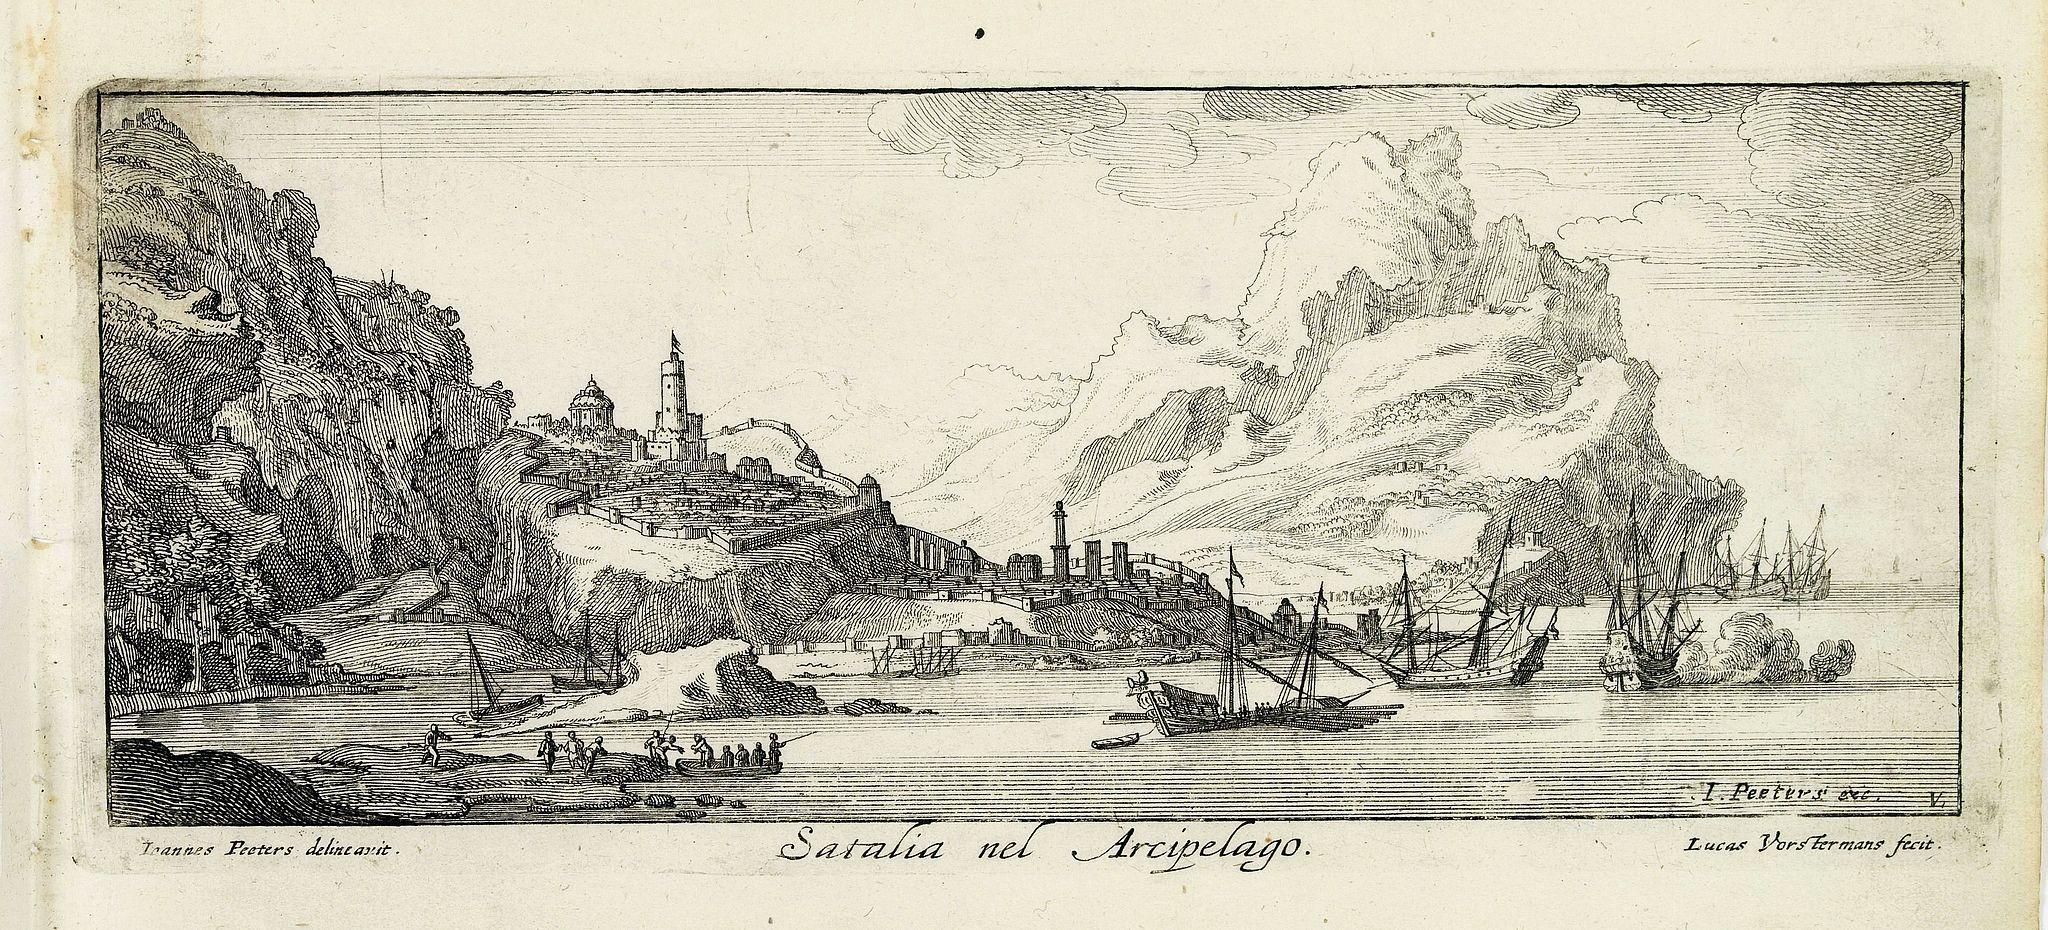 PEETERS, J. / VOSTERMANS II, L. -  Satalia nel arcipelago. (Antalya)